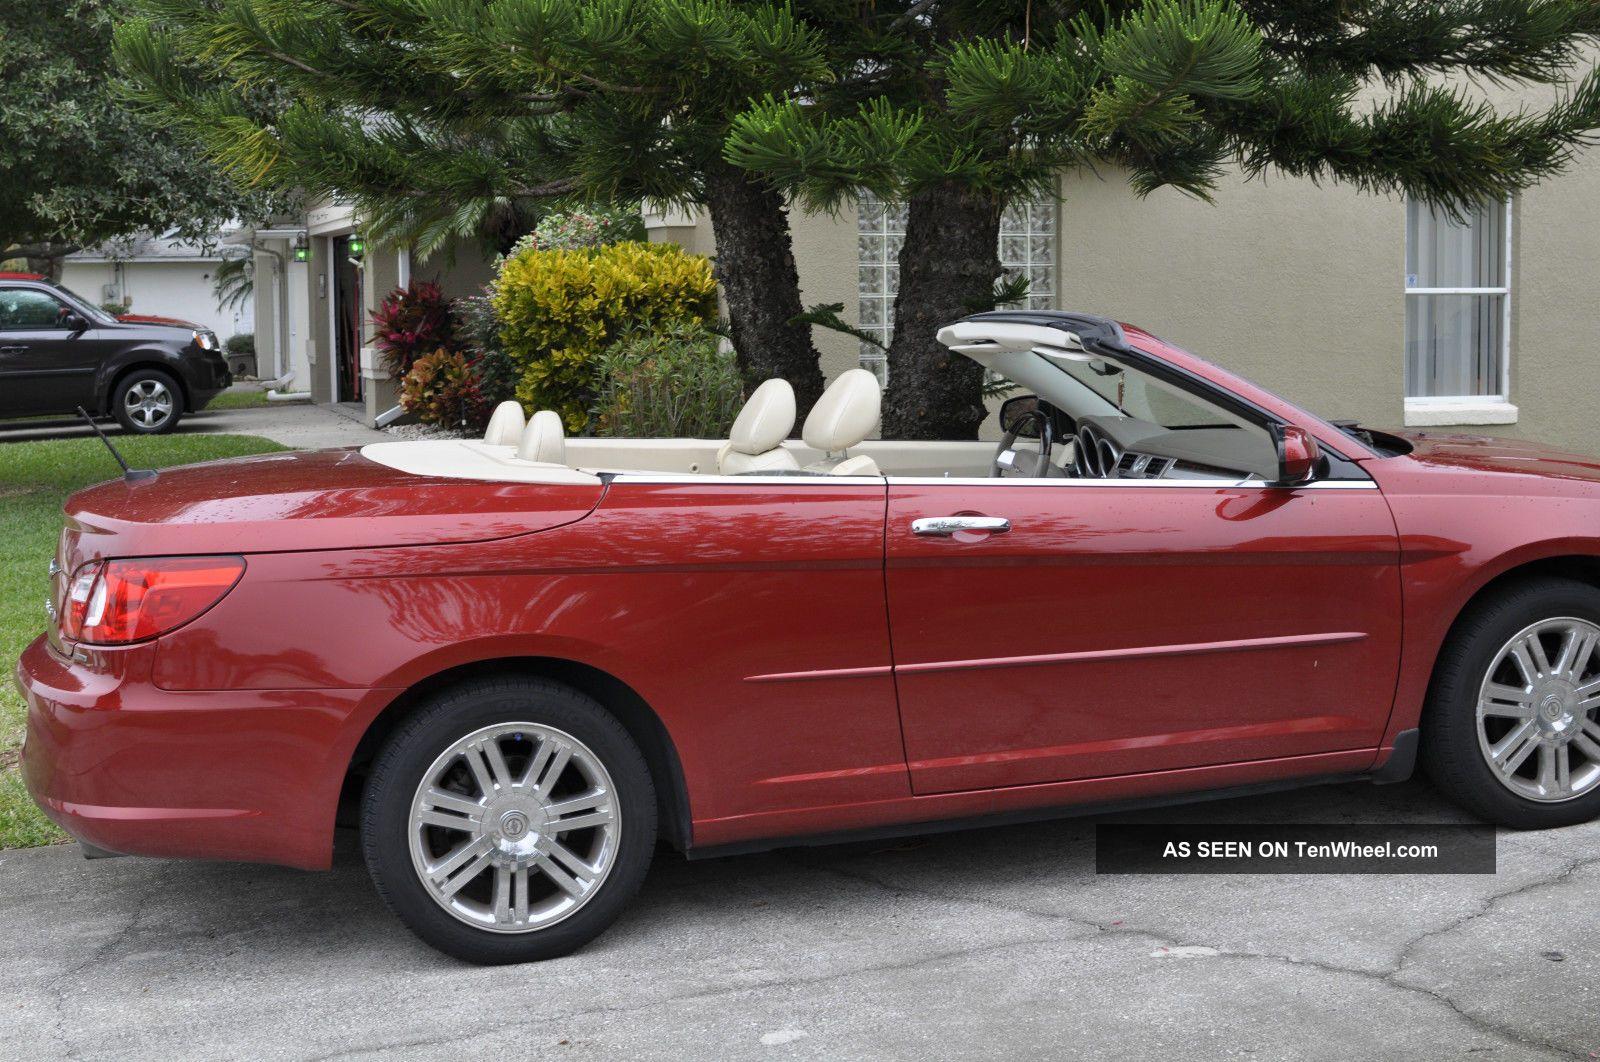 2008 Chrysler Sebring Limited Hard Top Convertiable Sebring photo